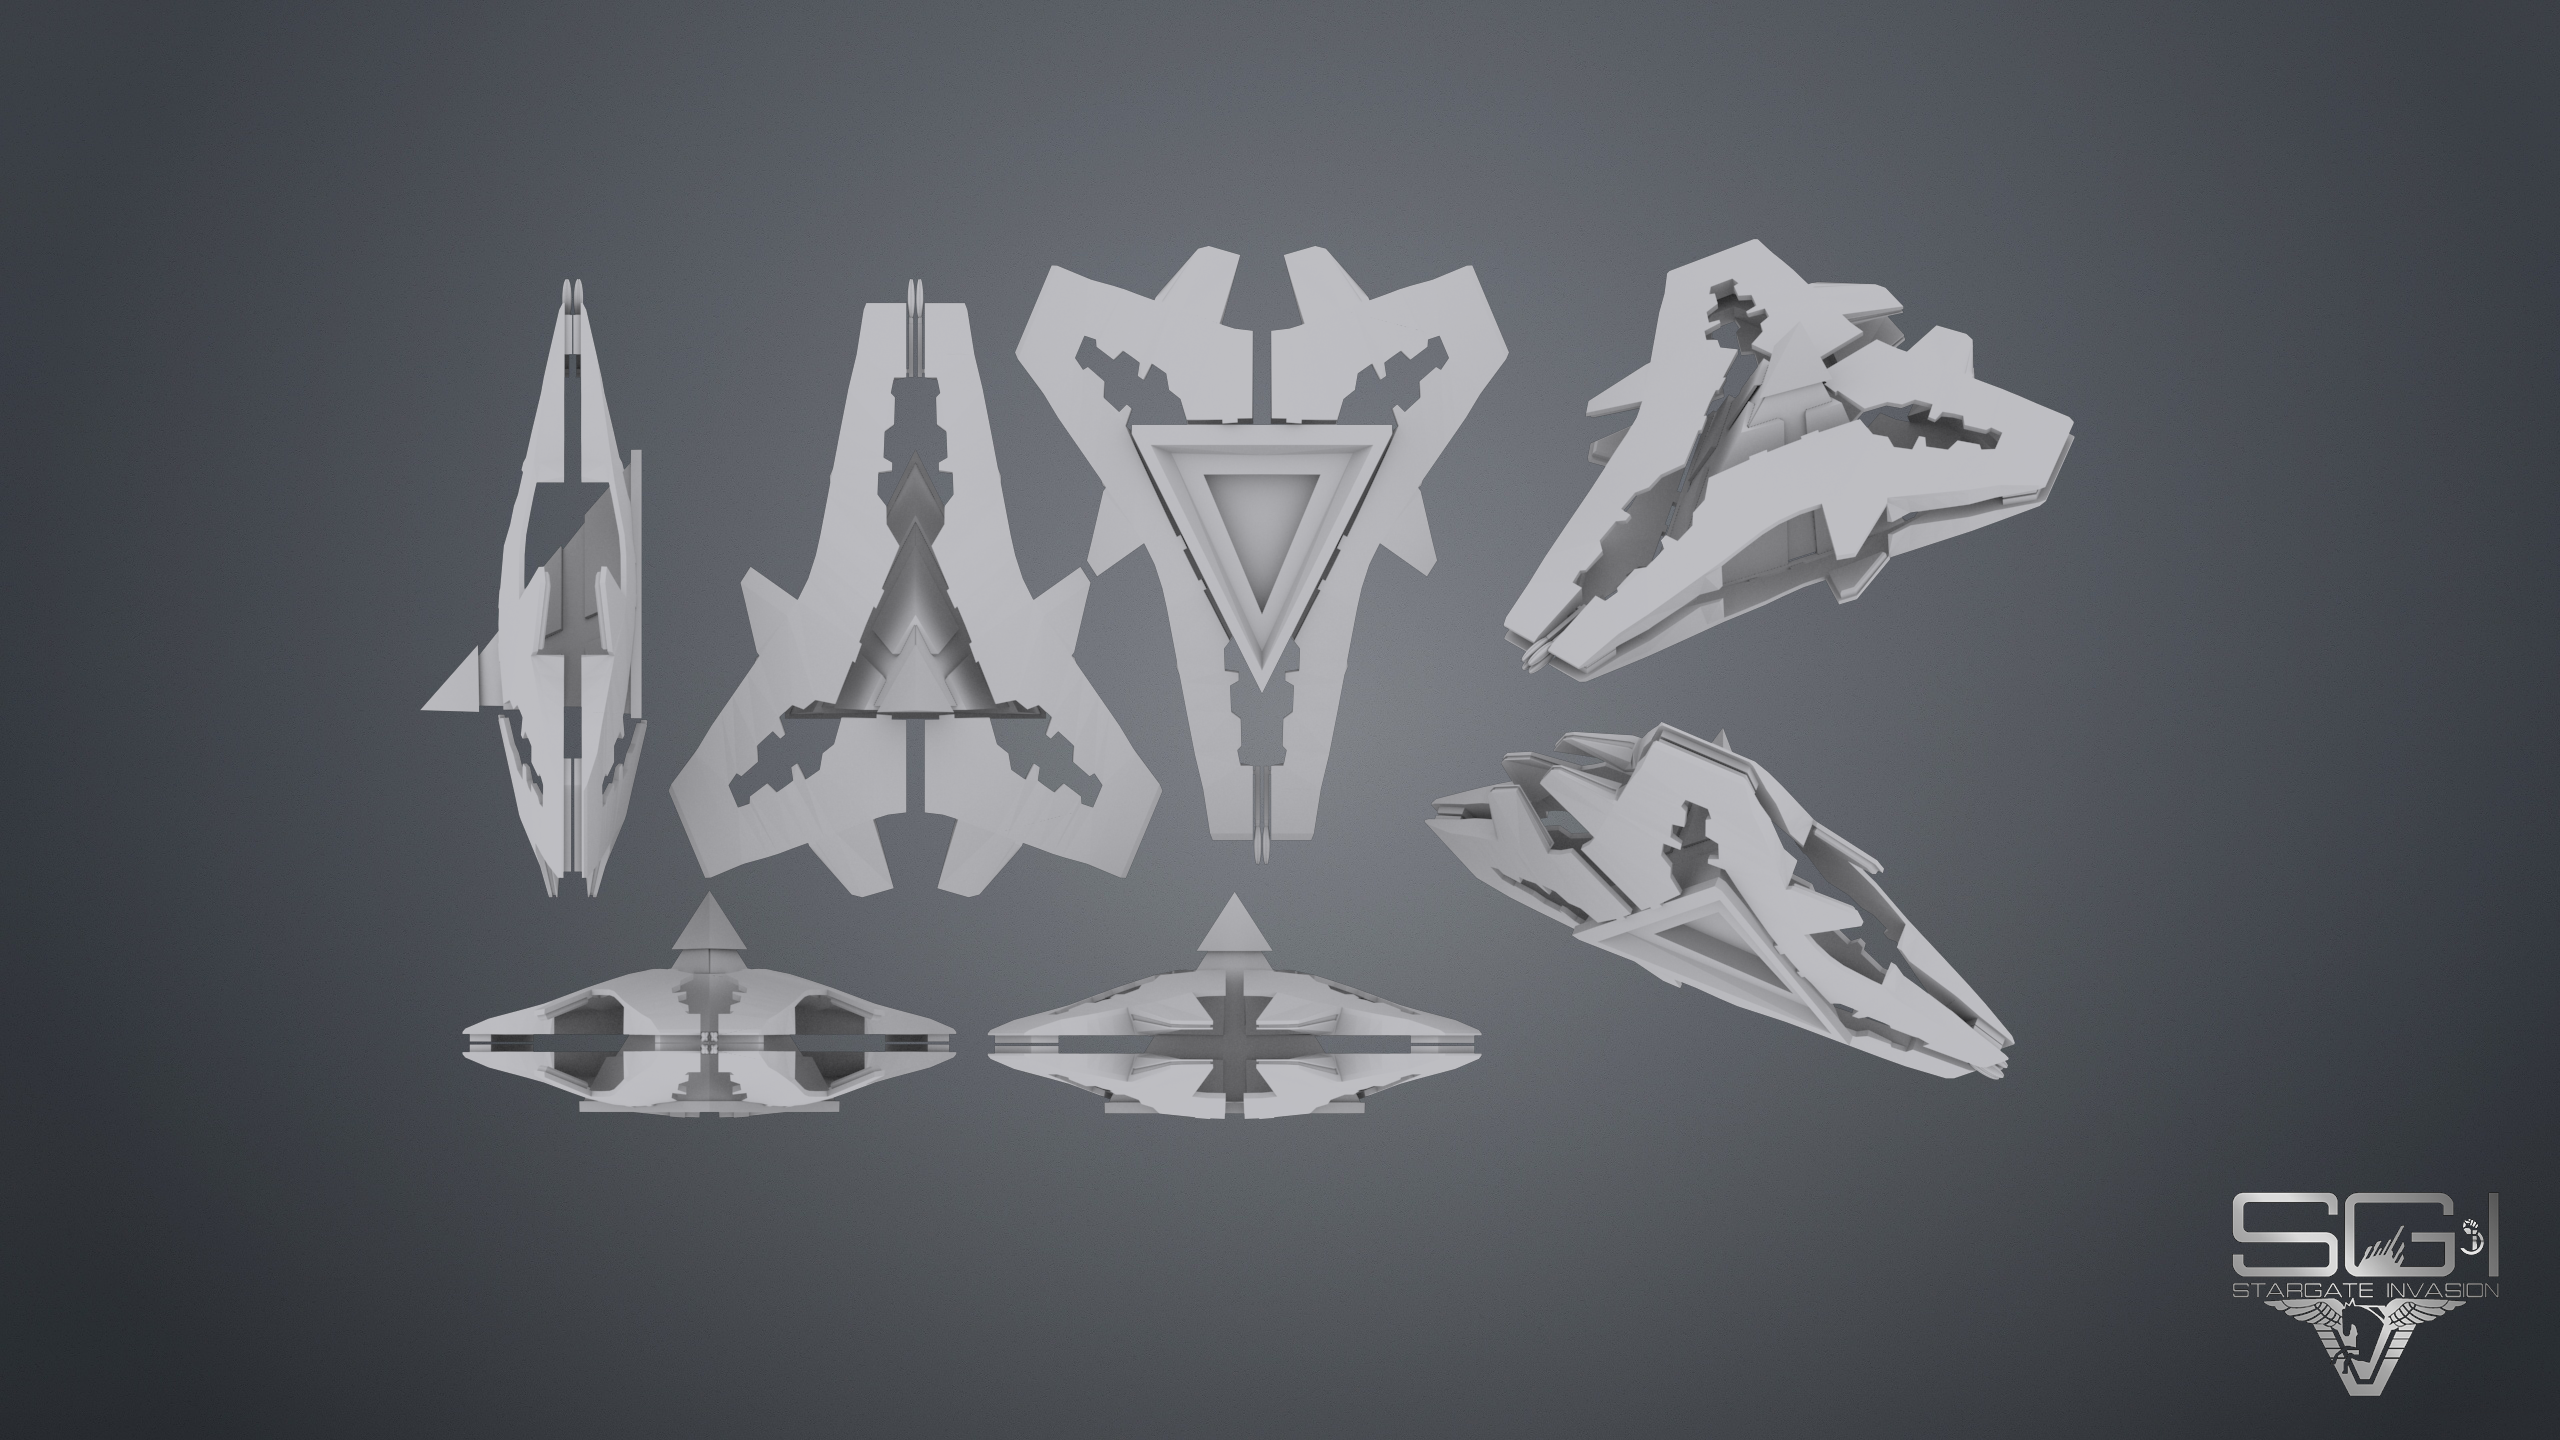 Goa'uld Capital Ship Model image - Stargate Invasion mod for Sins of a Solar Empire: Rebellion